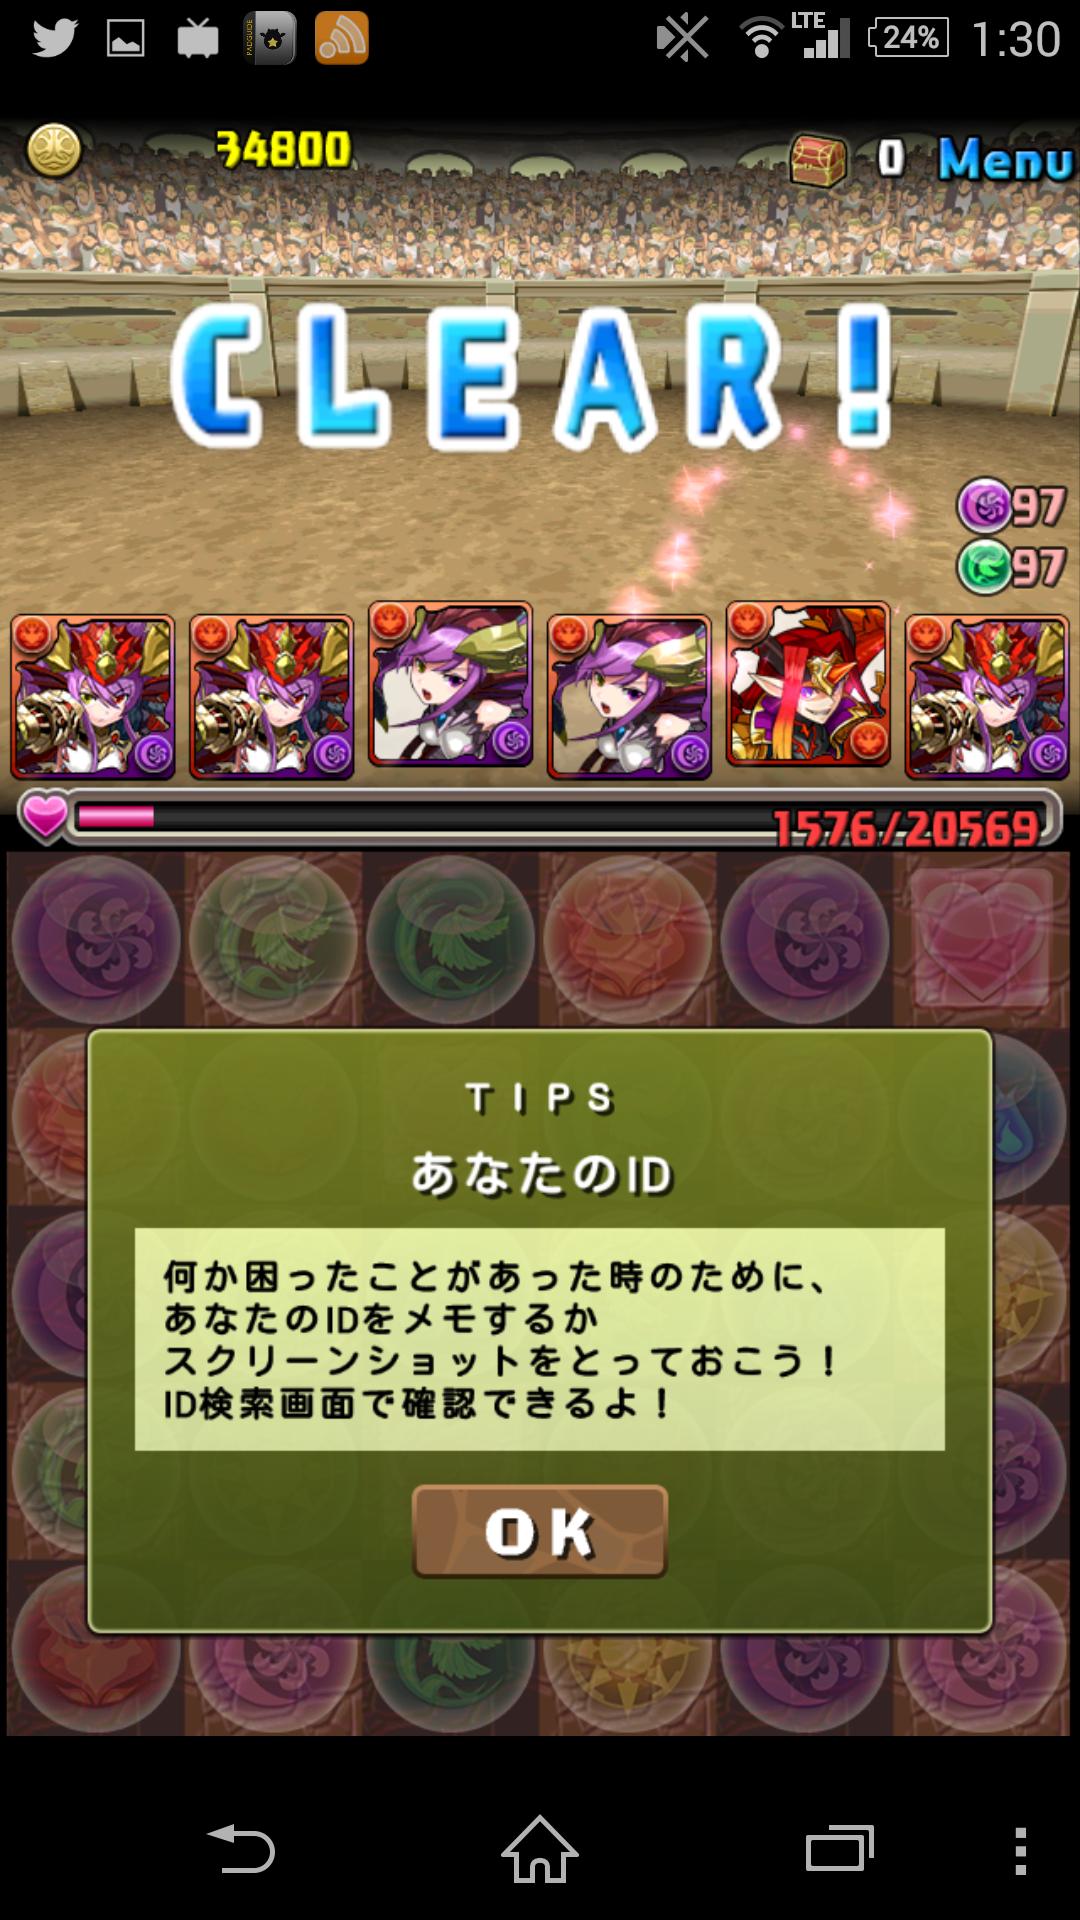 Screenshot_2015-02-11-01-30-08.png